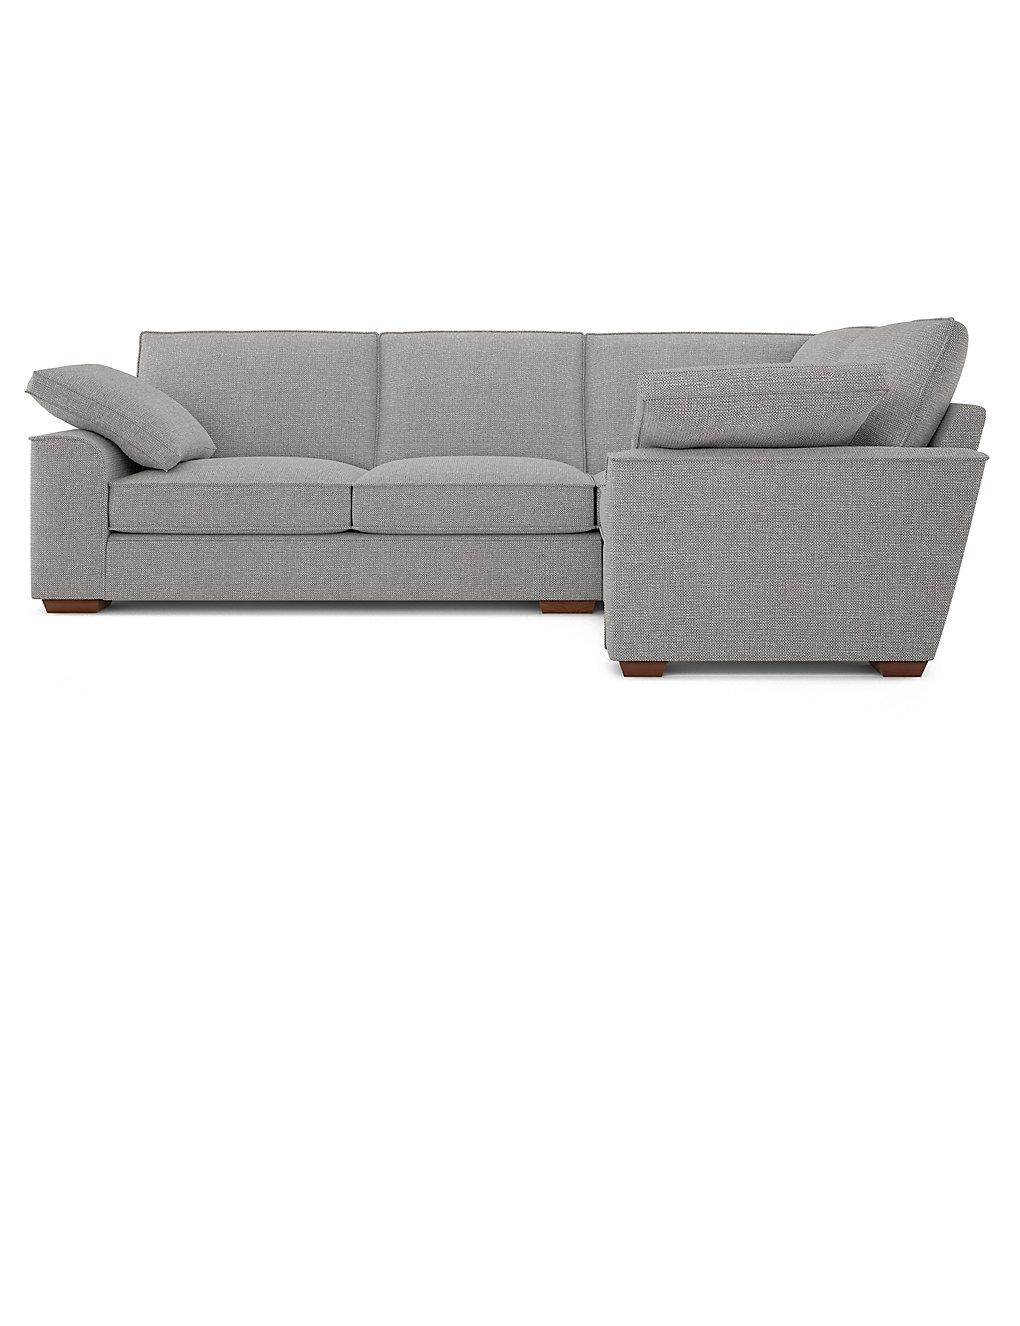 small corner furniture. nantucket small corner sofa righthand furniture g